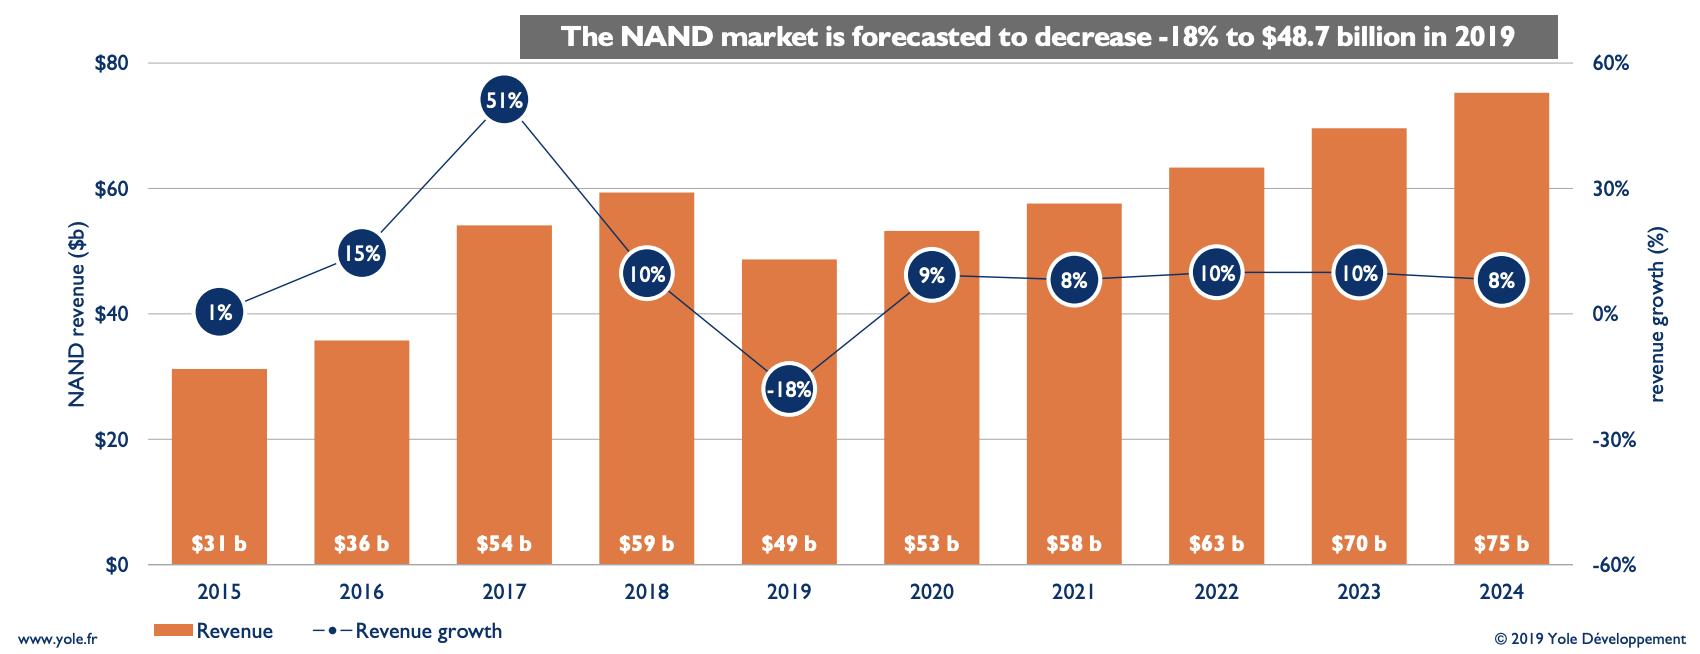 NAND Market